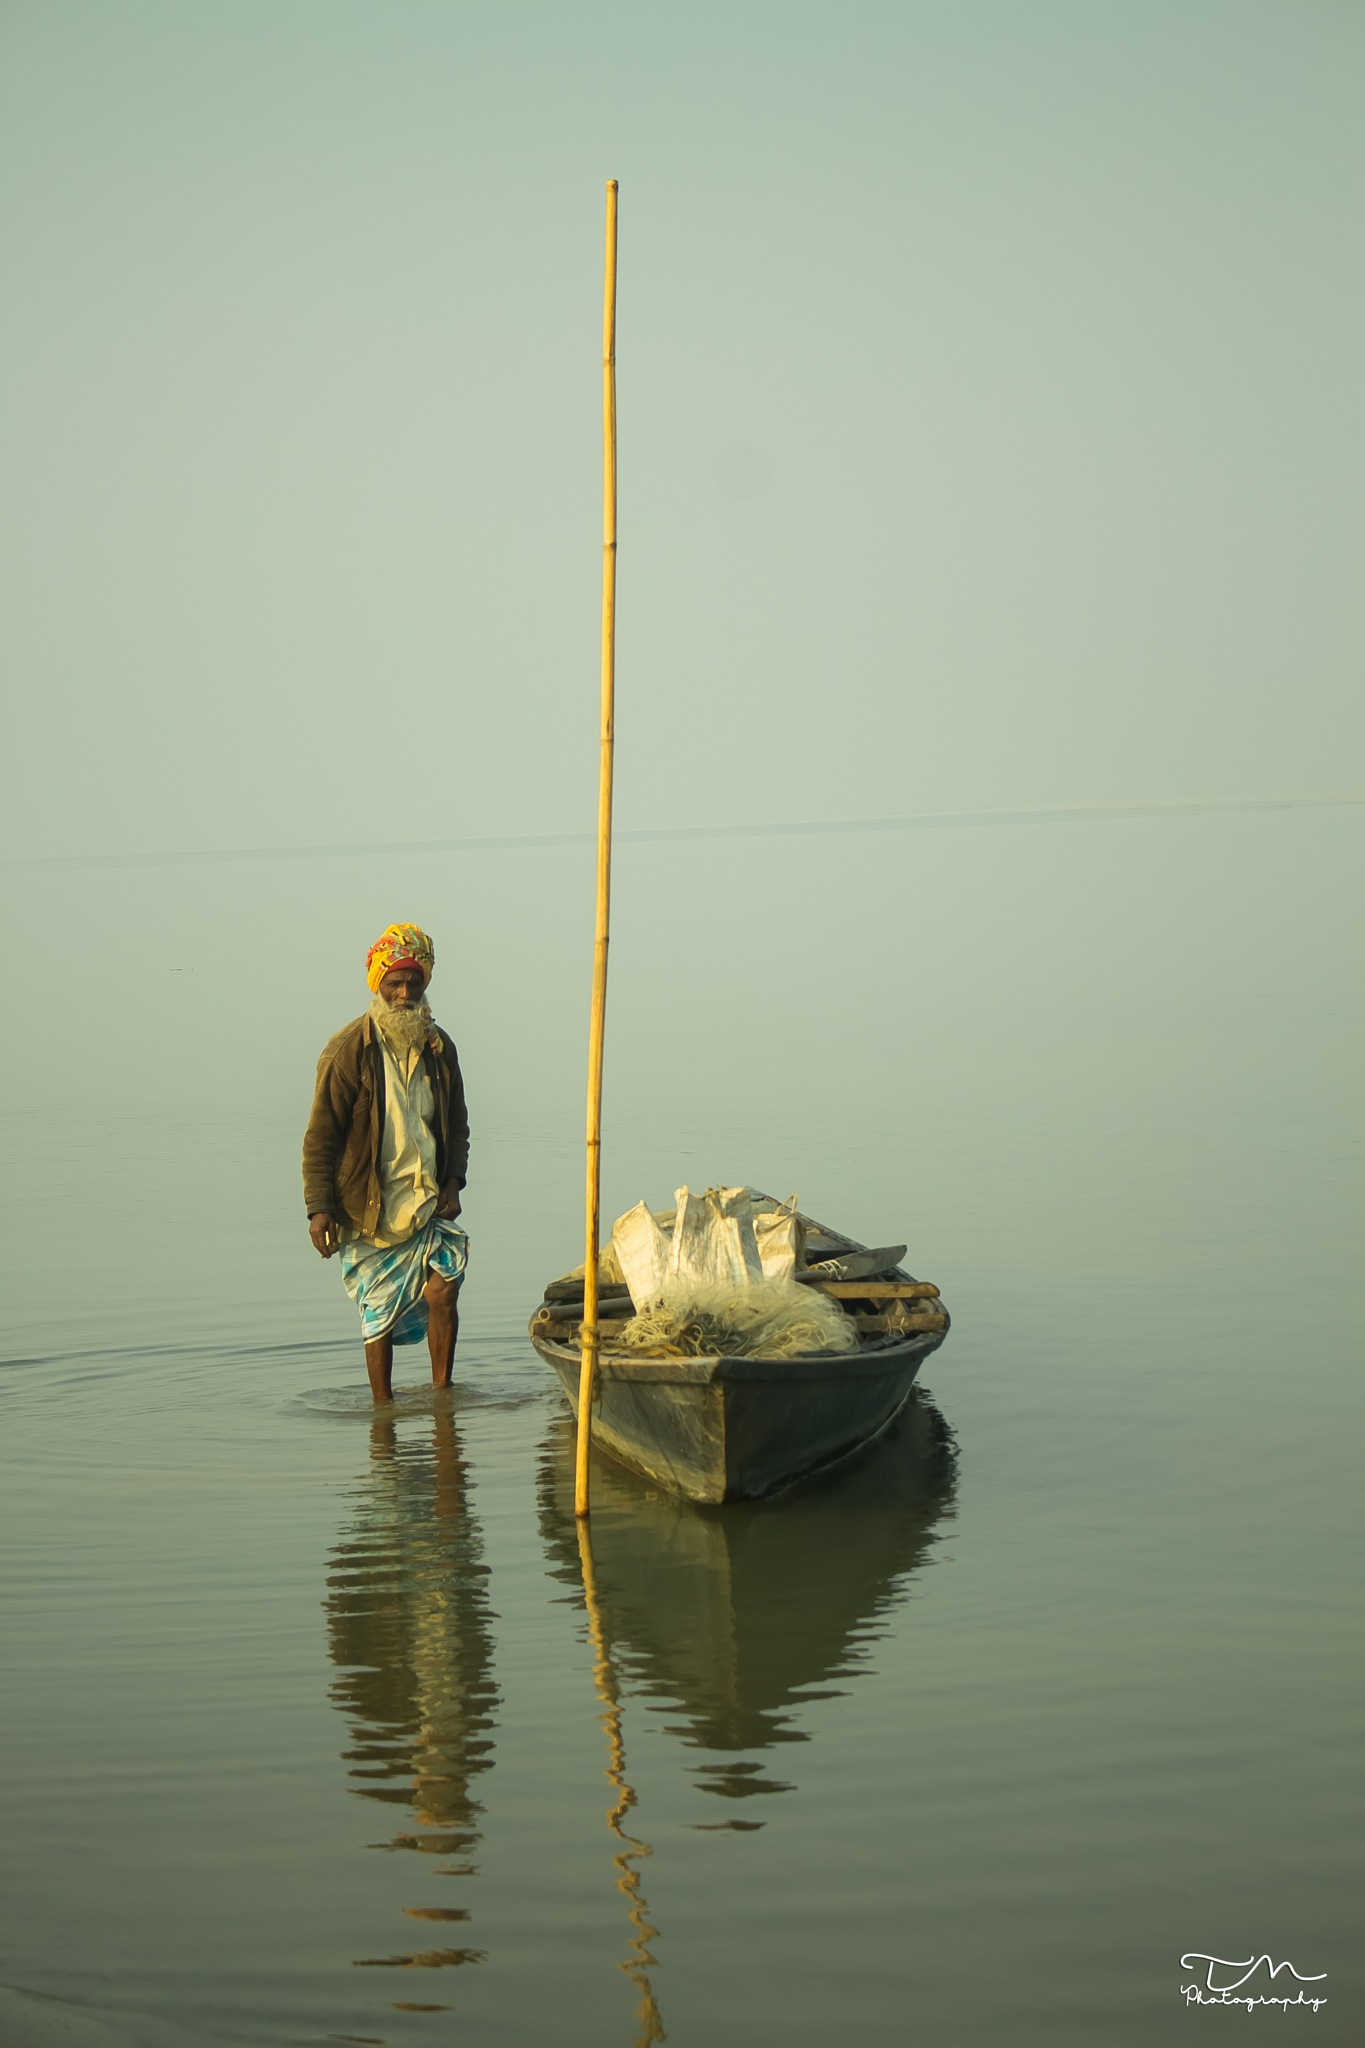 Untitled by T. M. Masum Billah